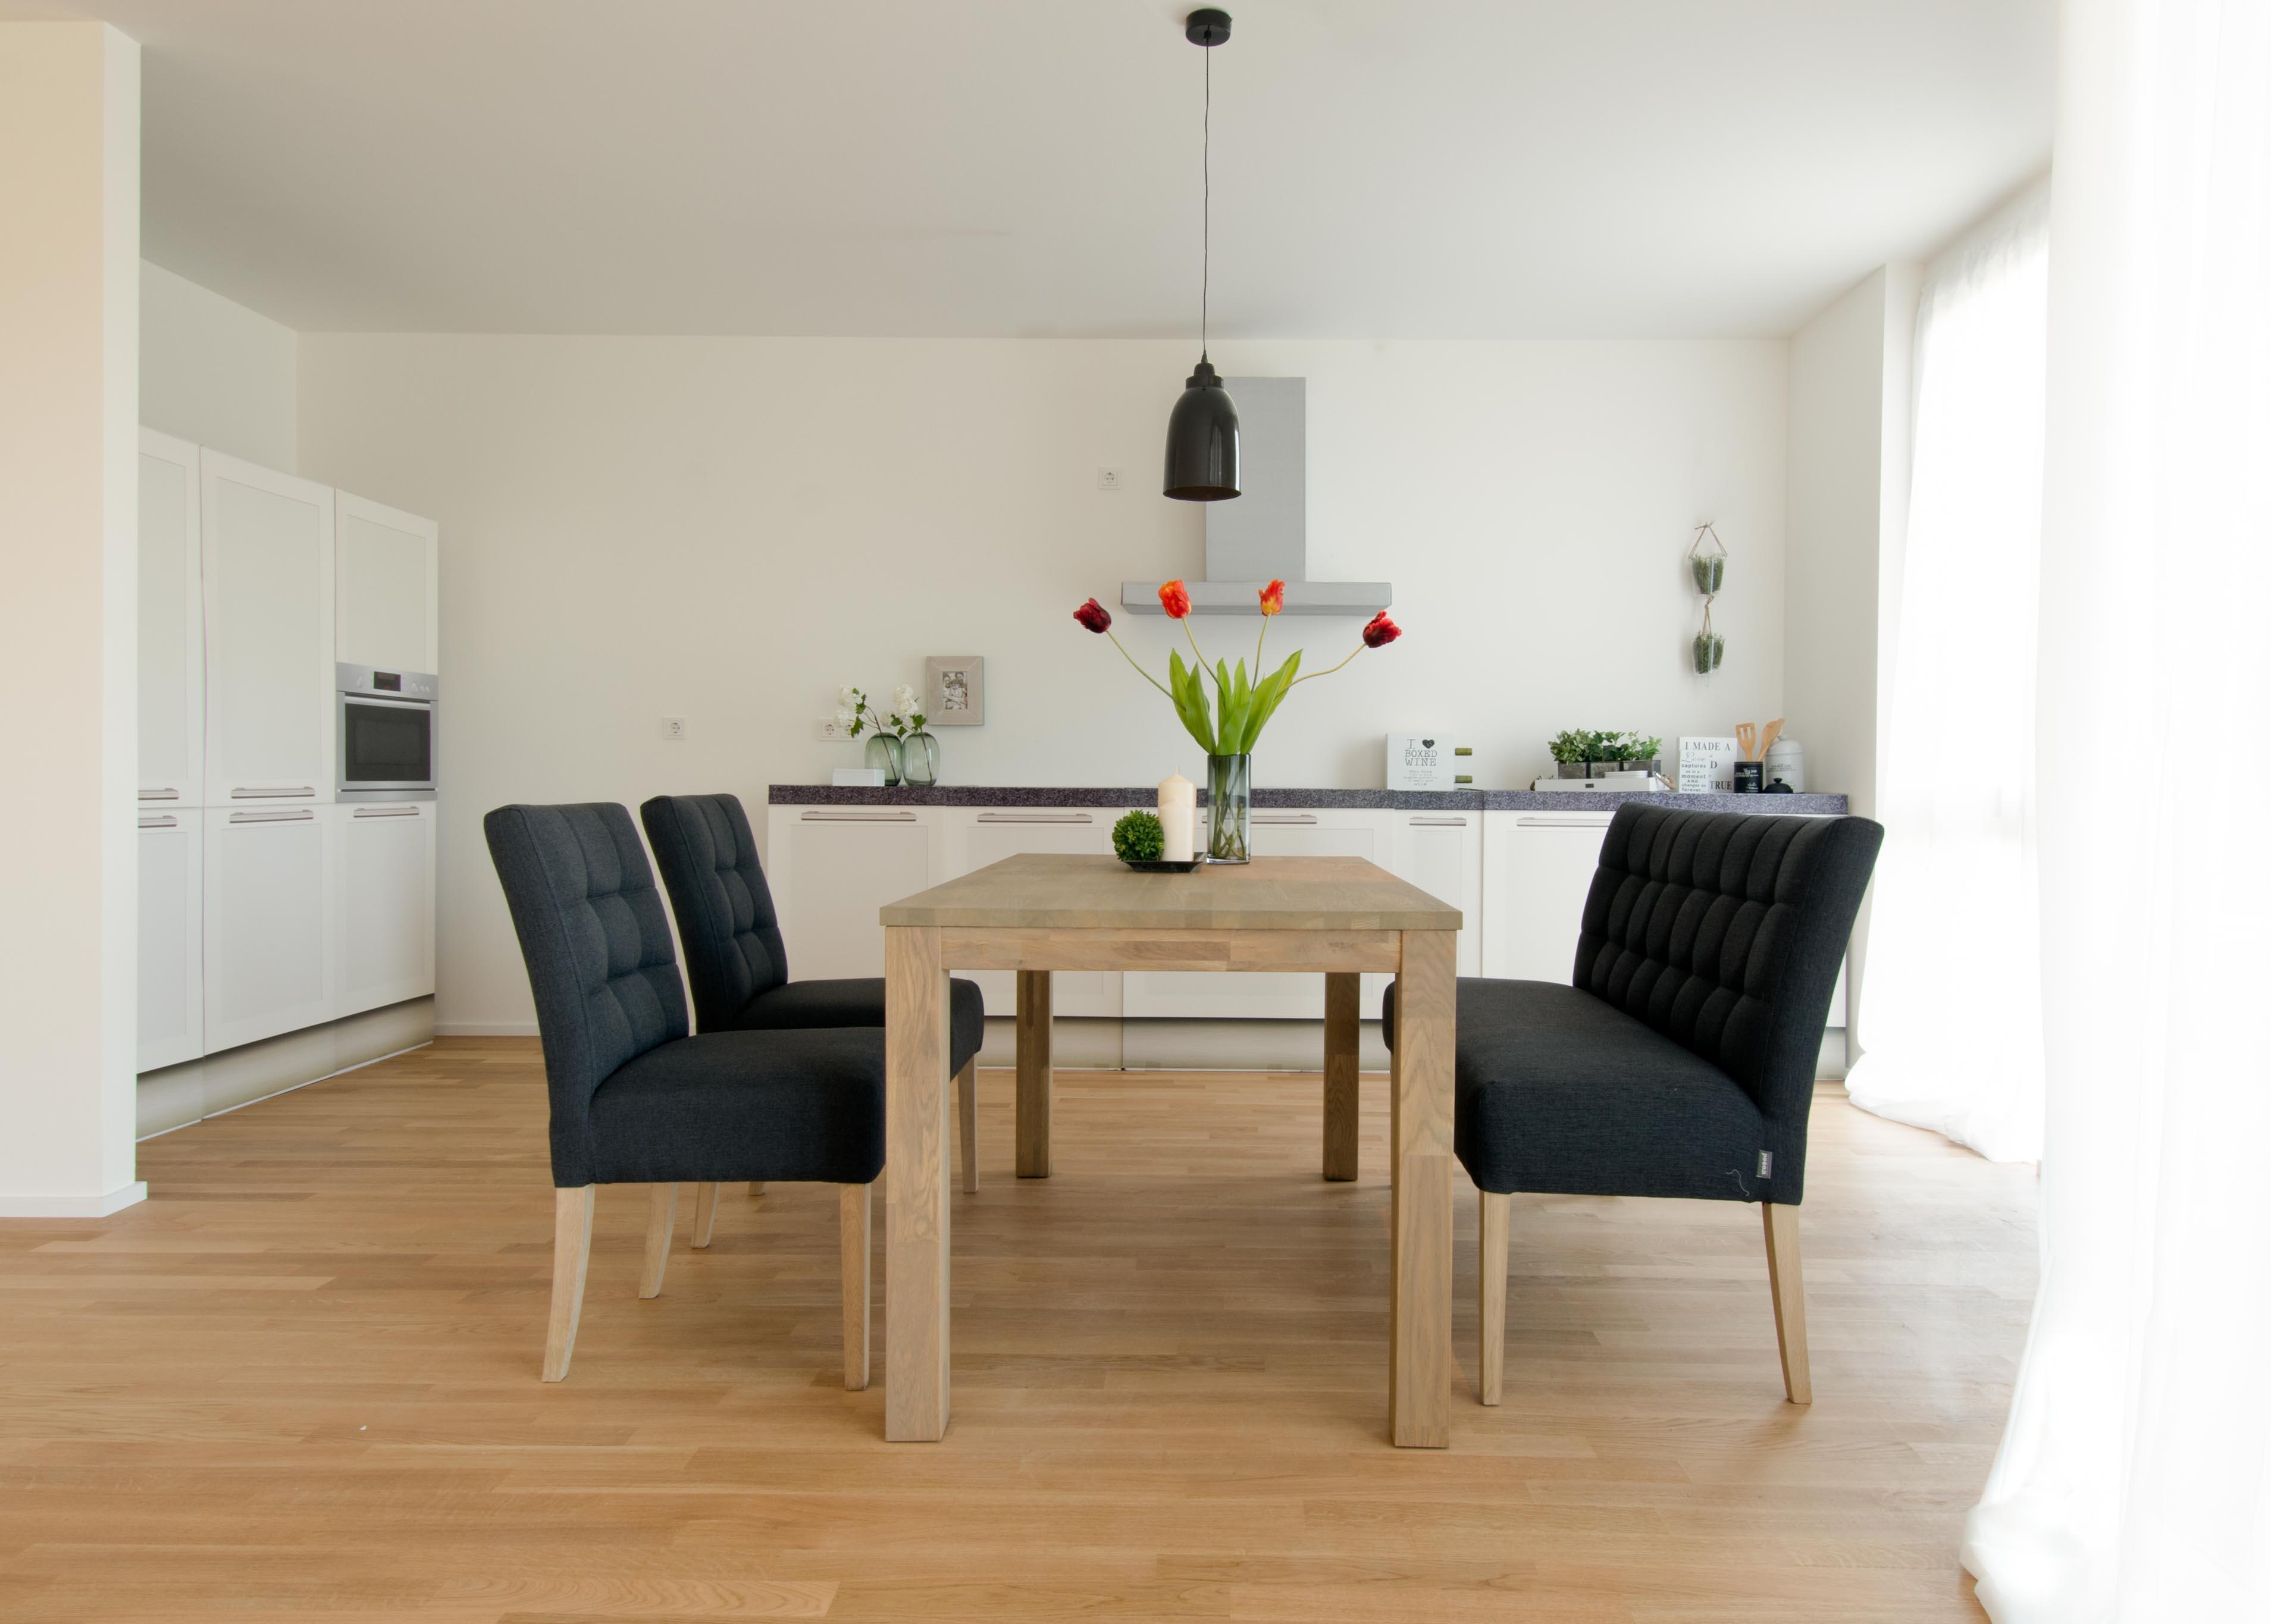 wei e k che bilder ideen couchstyle. Black Bedroom Furniture Sets. Home Design Ideas